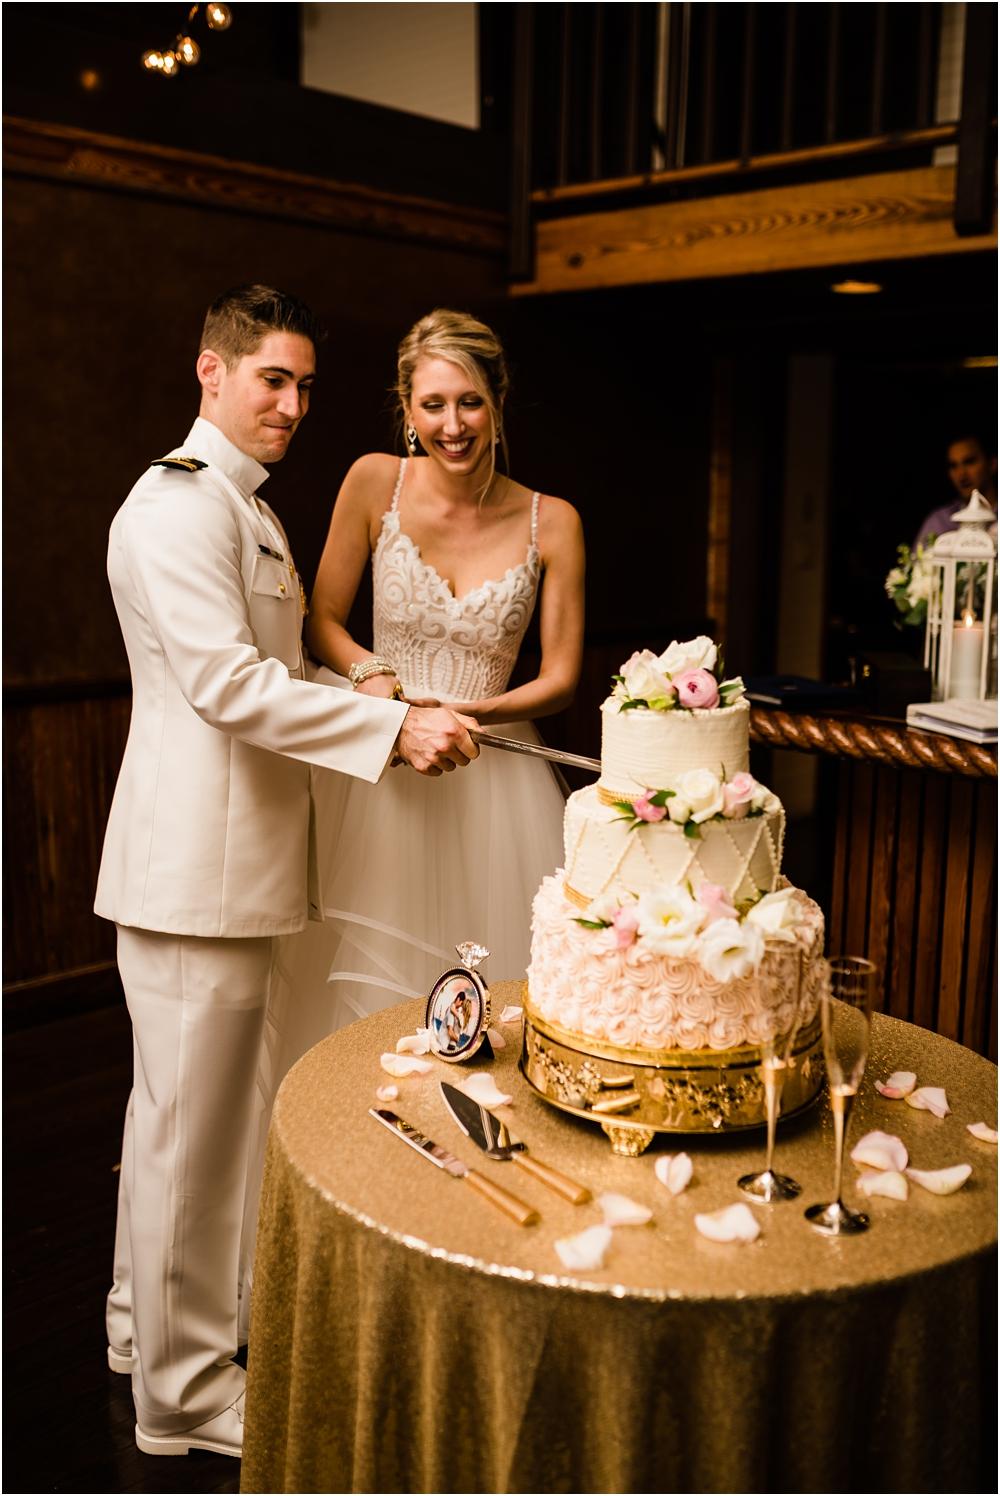 oconnor-pensacola-florida-wedding-photographer-kiersten-taylor-125.jpg